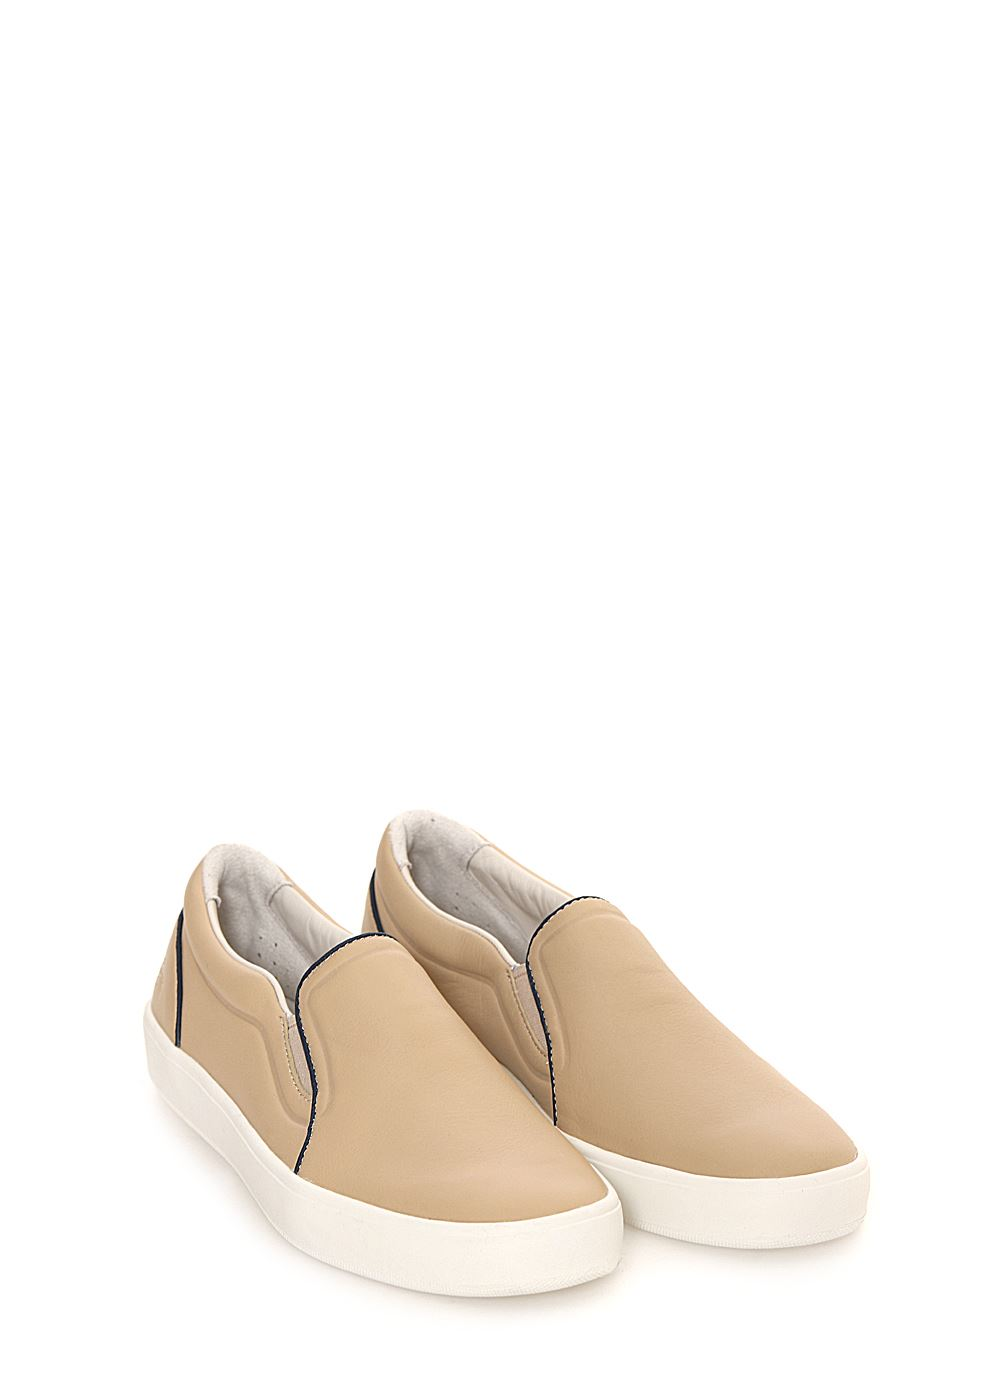 Walking Style - Γυναικεία Παπούτσια LACOSTE